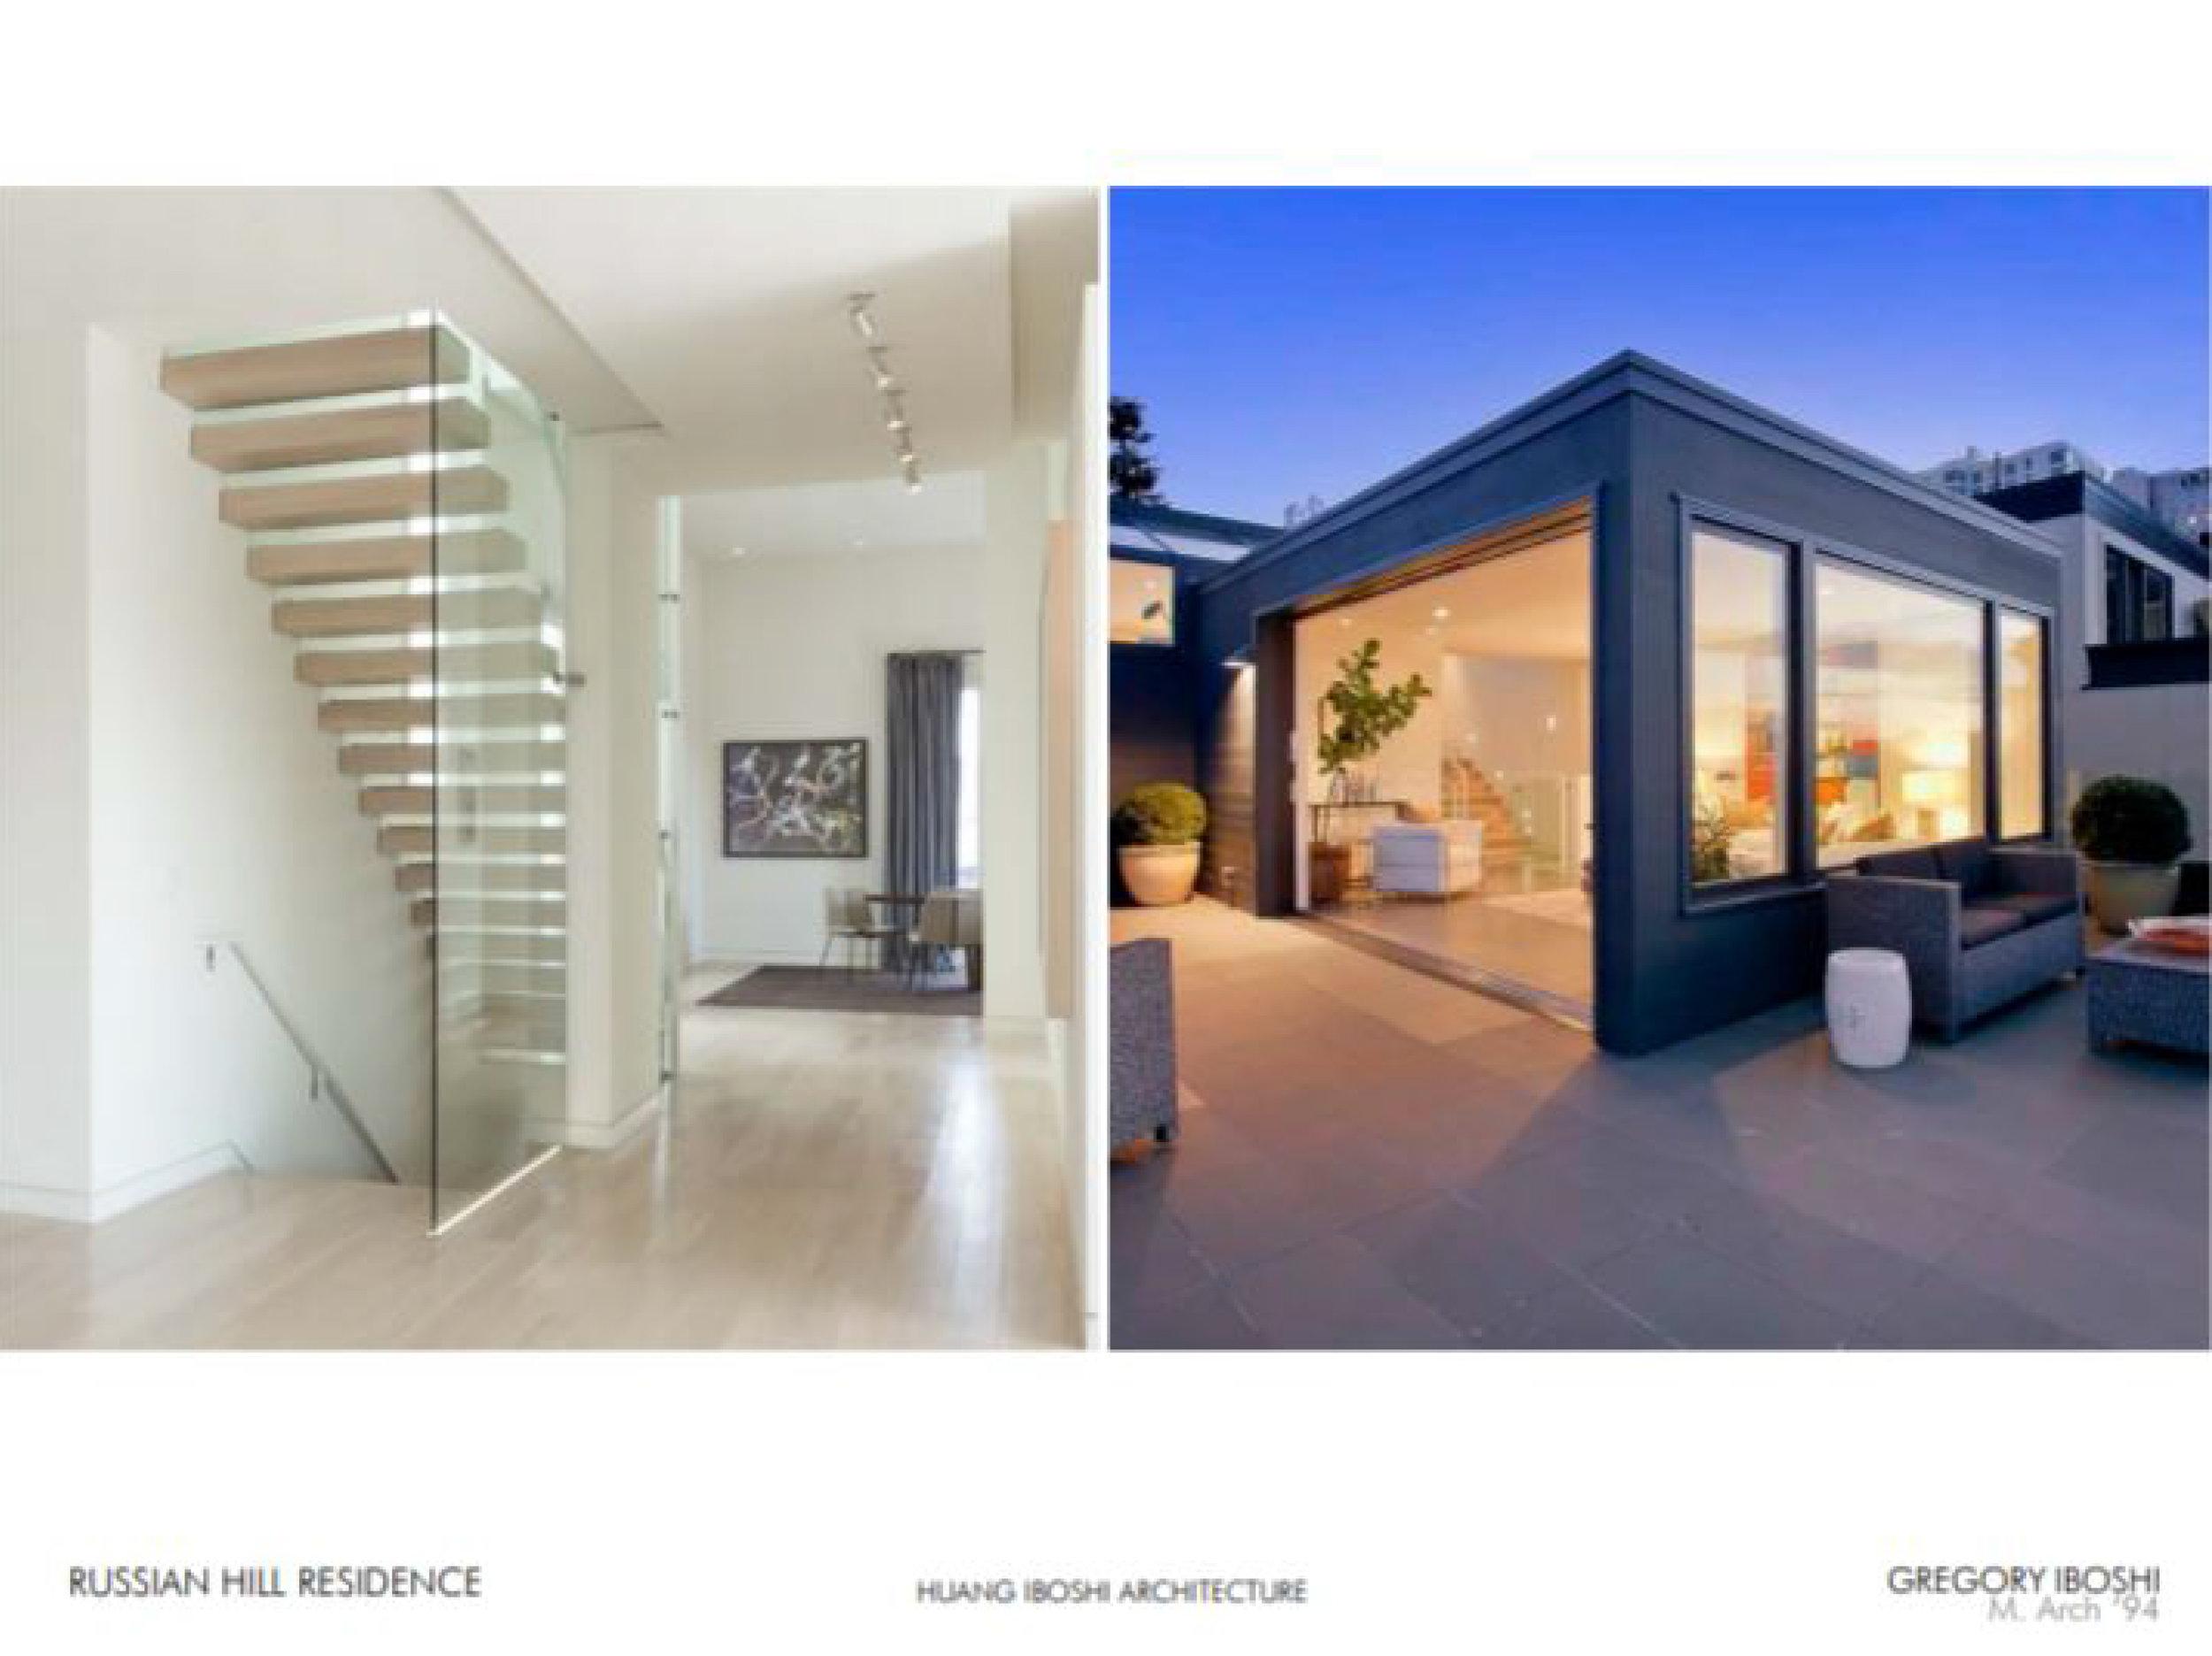 MIT ARCHITECTURE 150 SAN FRANCISCO SLIDESHOW-88 copy.jpg